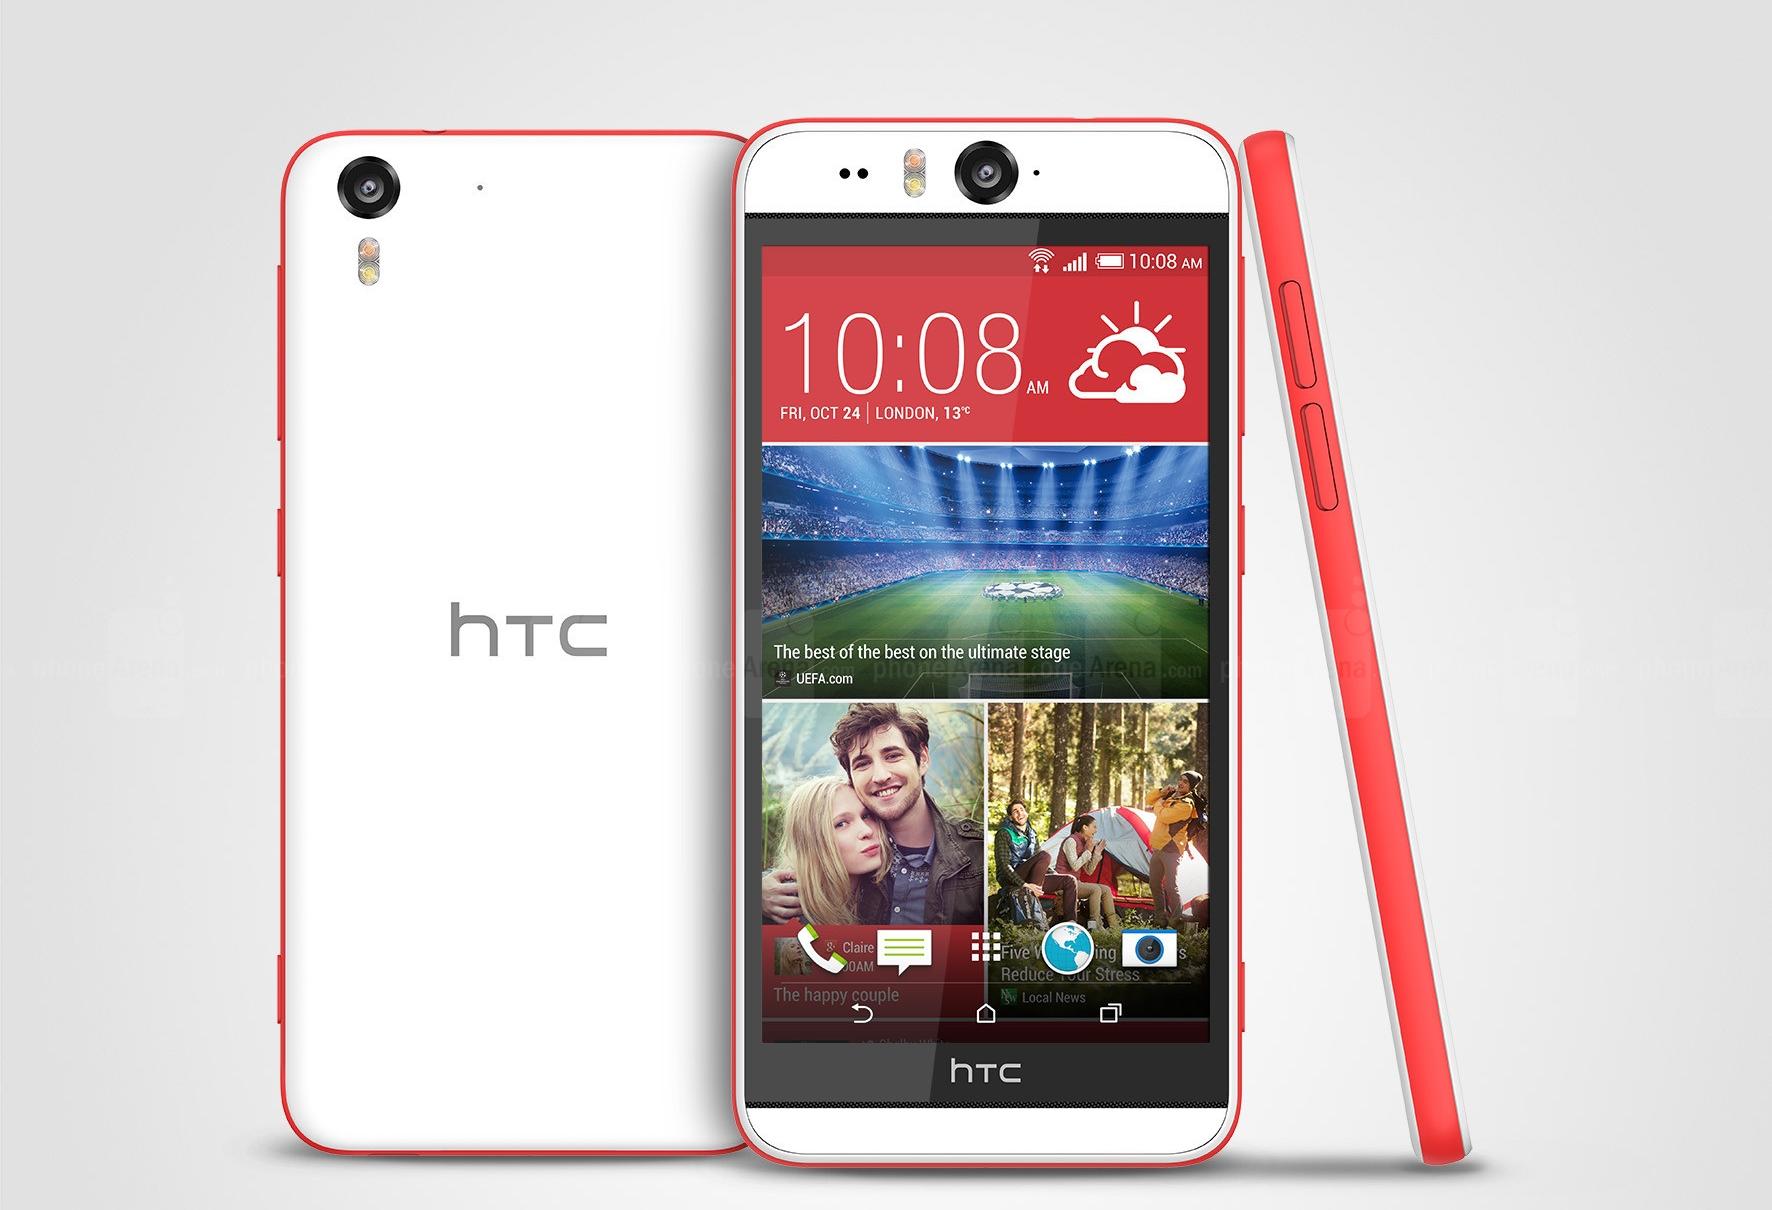 Resim http://cdn.webtekno.com/custom/images/efsane-mi-kestane-mi/xperia-z6/HTC-Desire-EYE-6.jpg